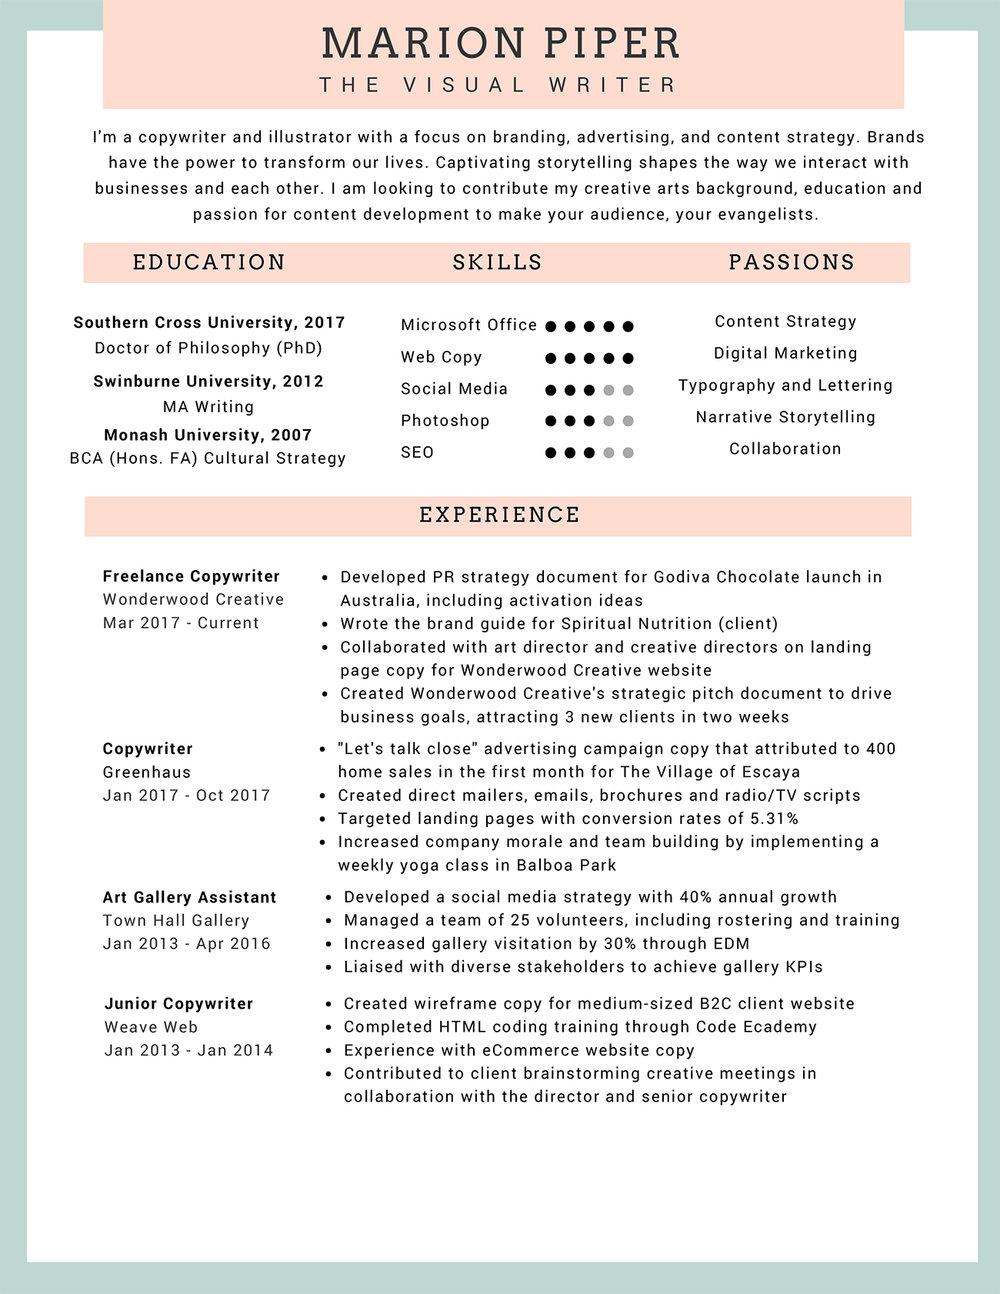 cv resume the visual writer